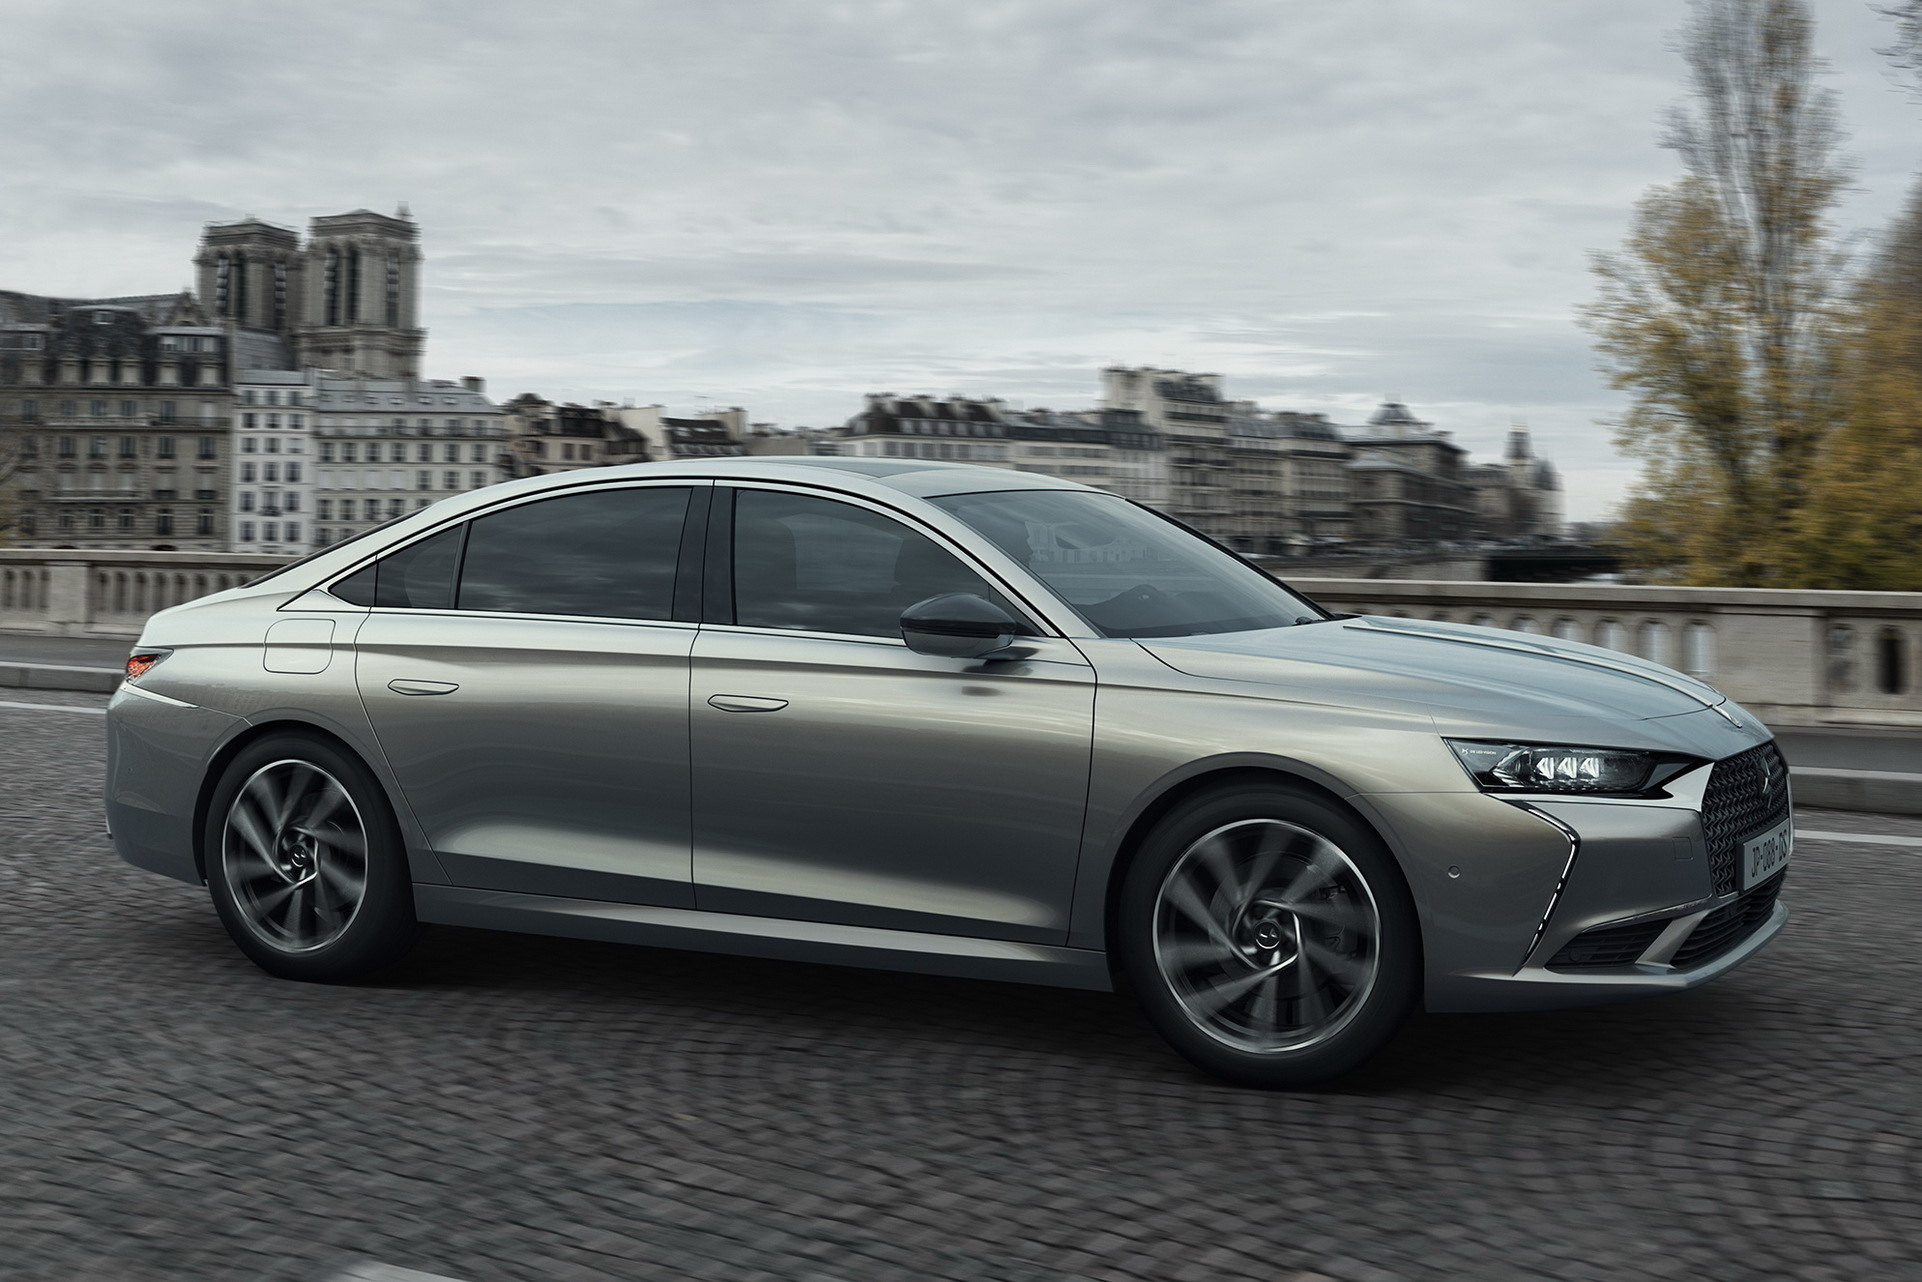 DS 9 é o novo modelo topo da gama da marca de luxo da PSA